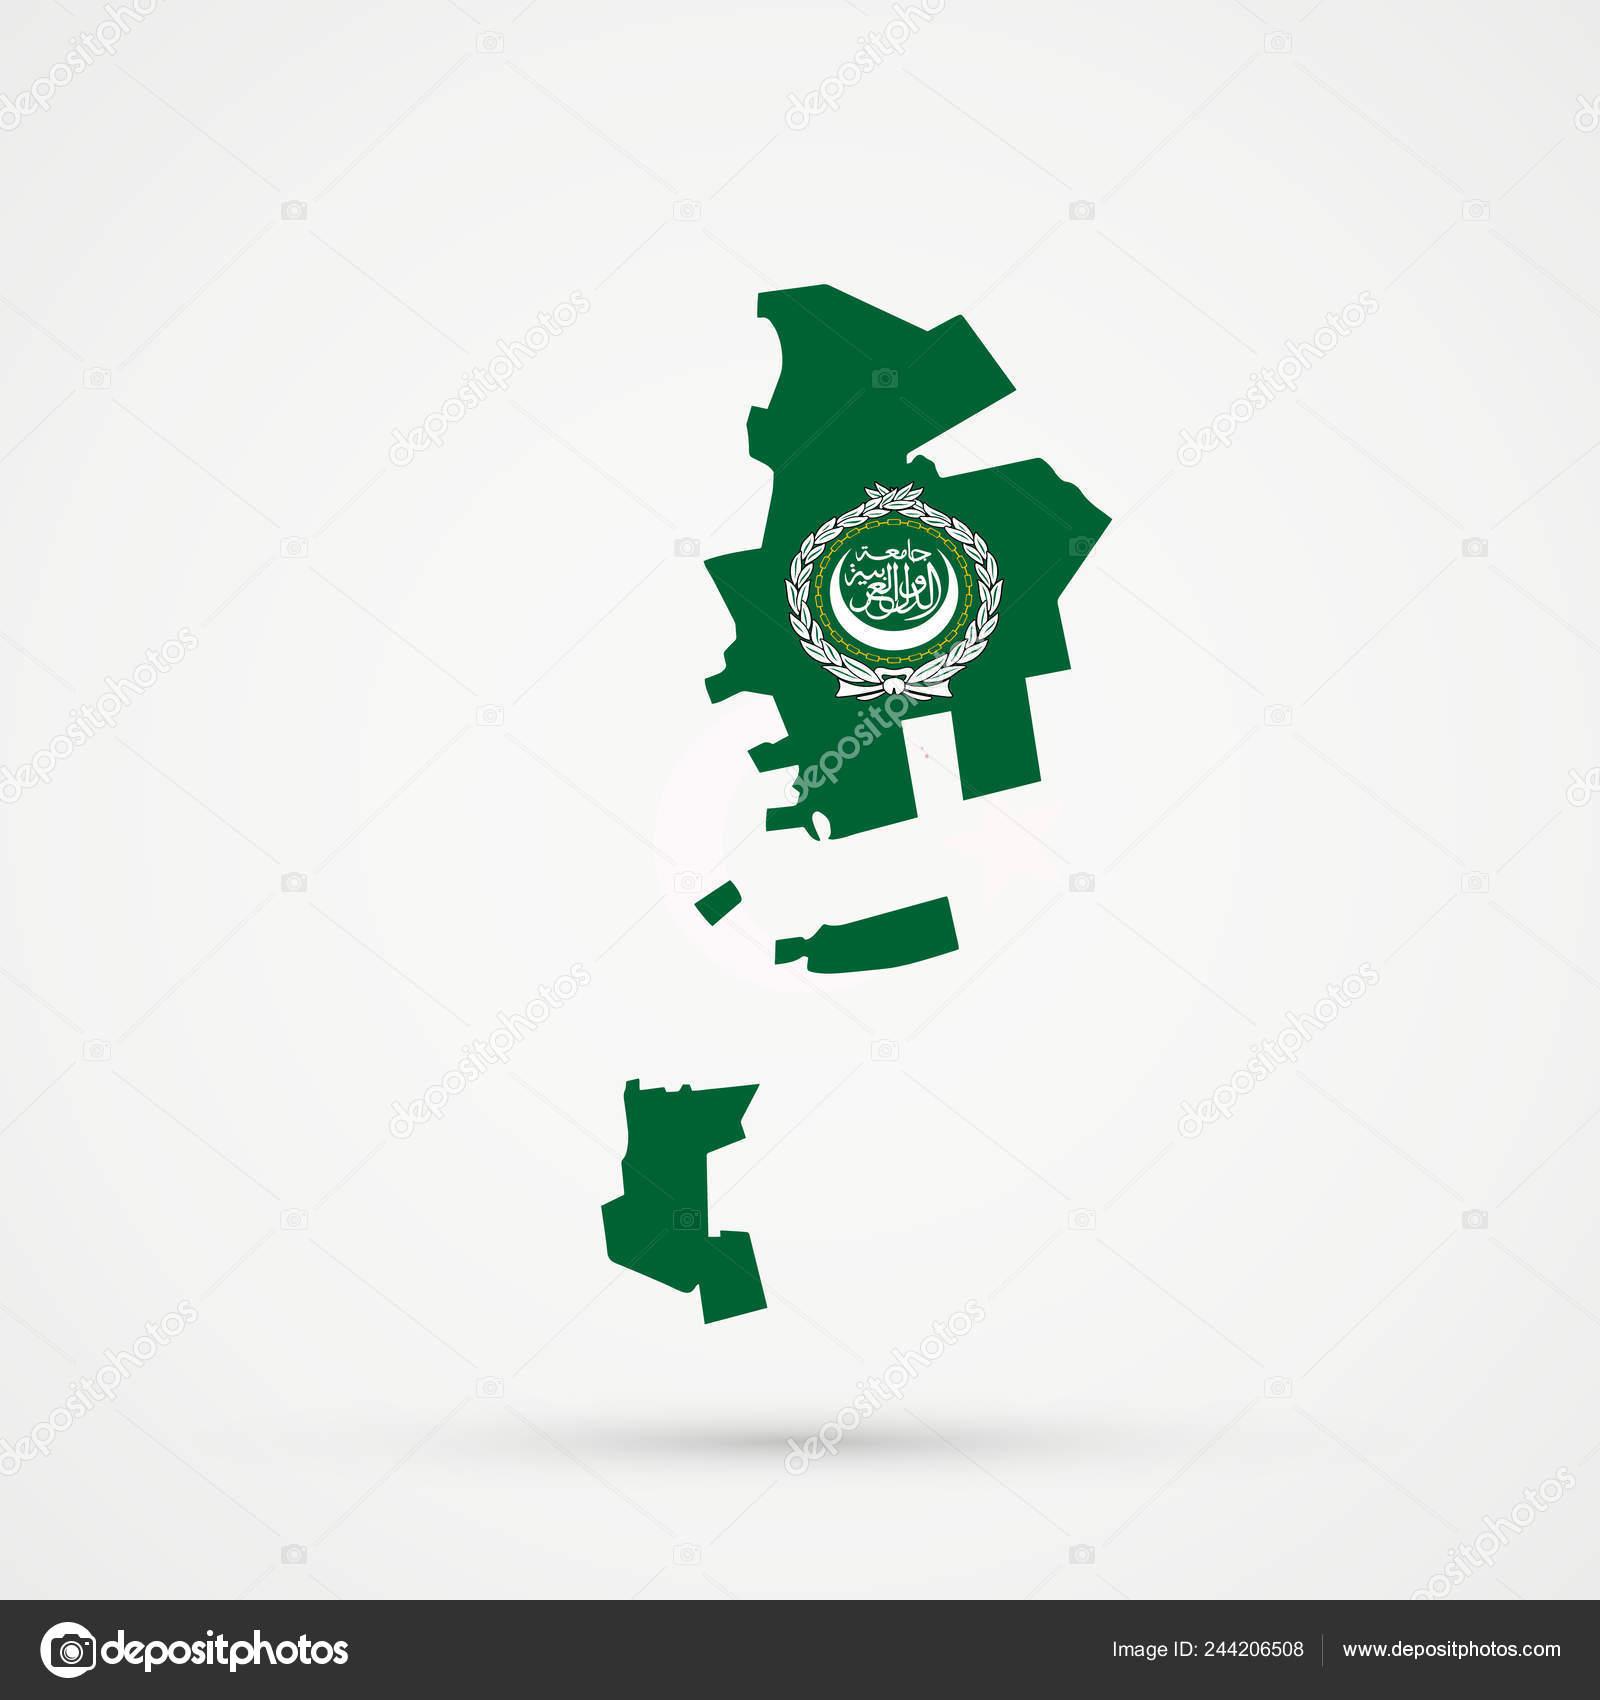 Picture of: Gagauzia Map Arab League Flag Colors Editable Vector Stock Vector C L8l 244206508